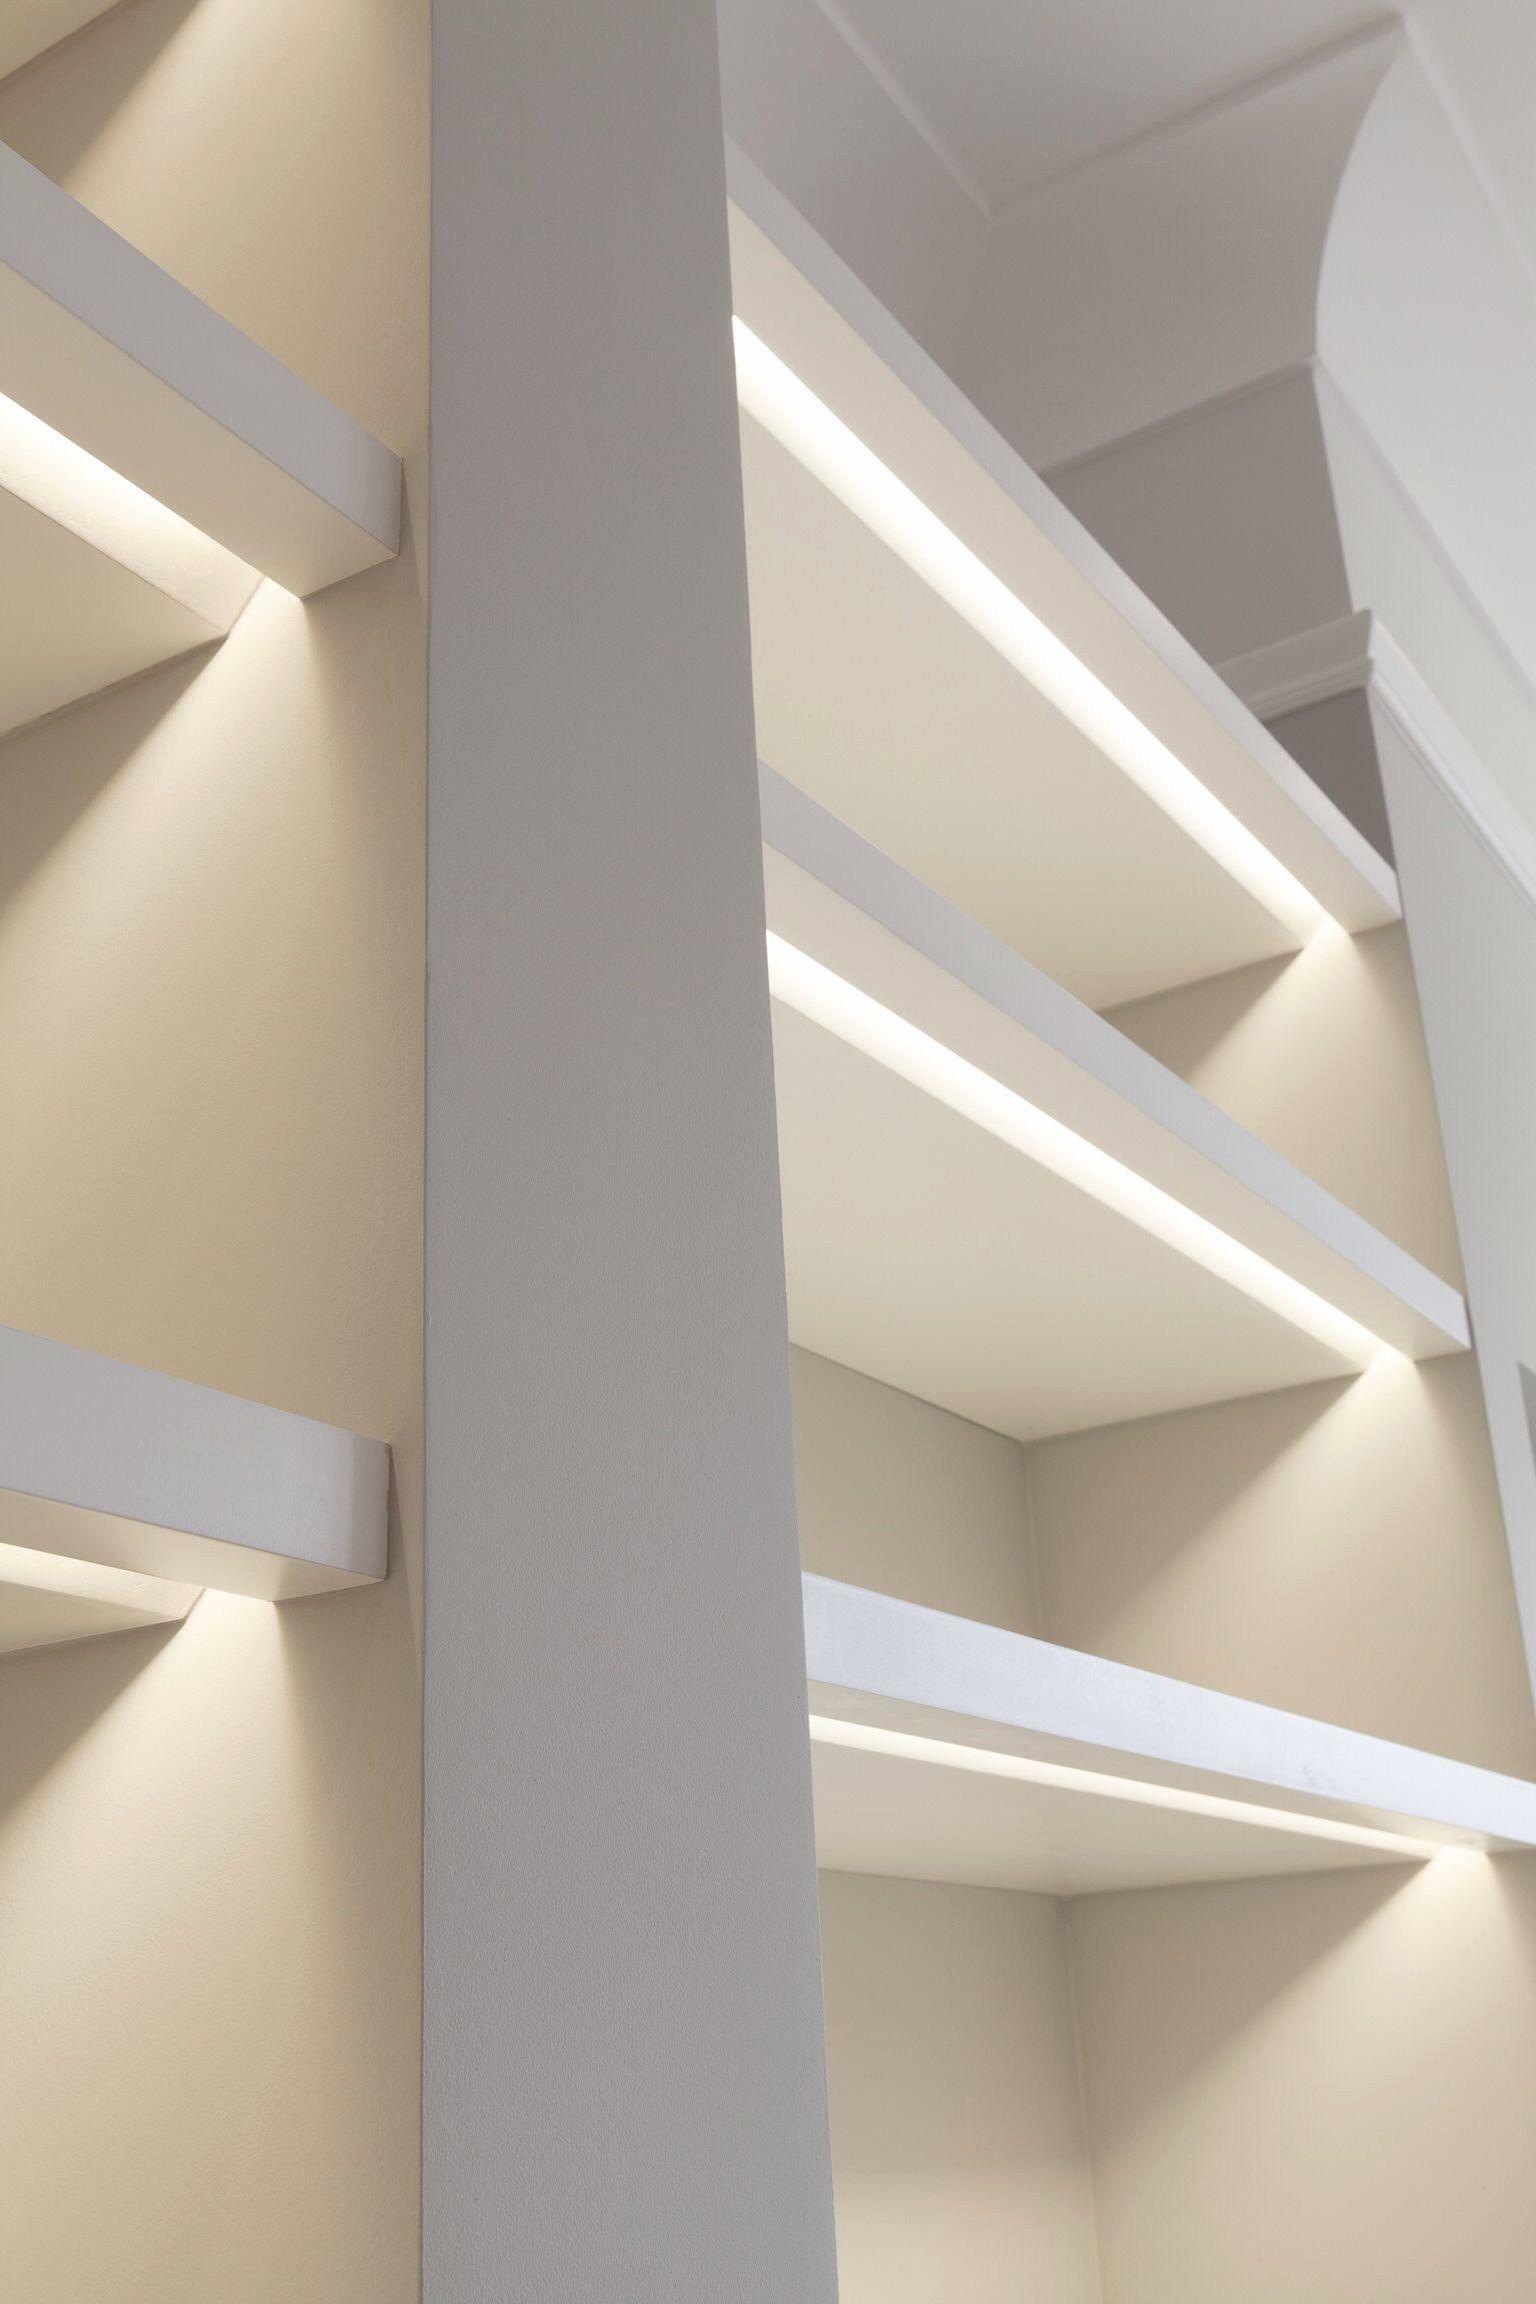 Regal Mit Licht New Edle Lichtelement Mb Light It Up Pinterest